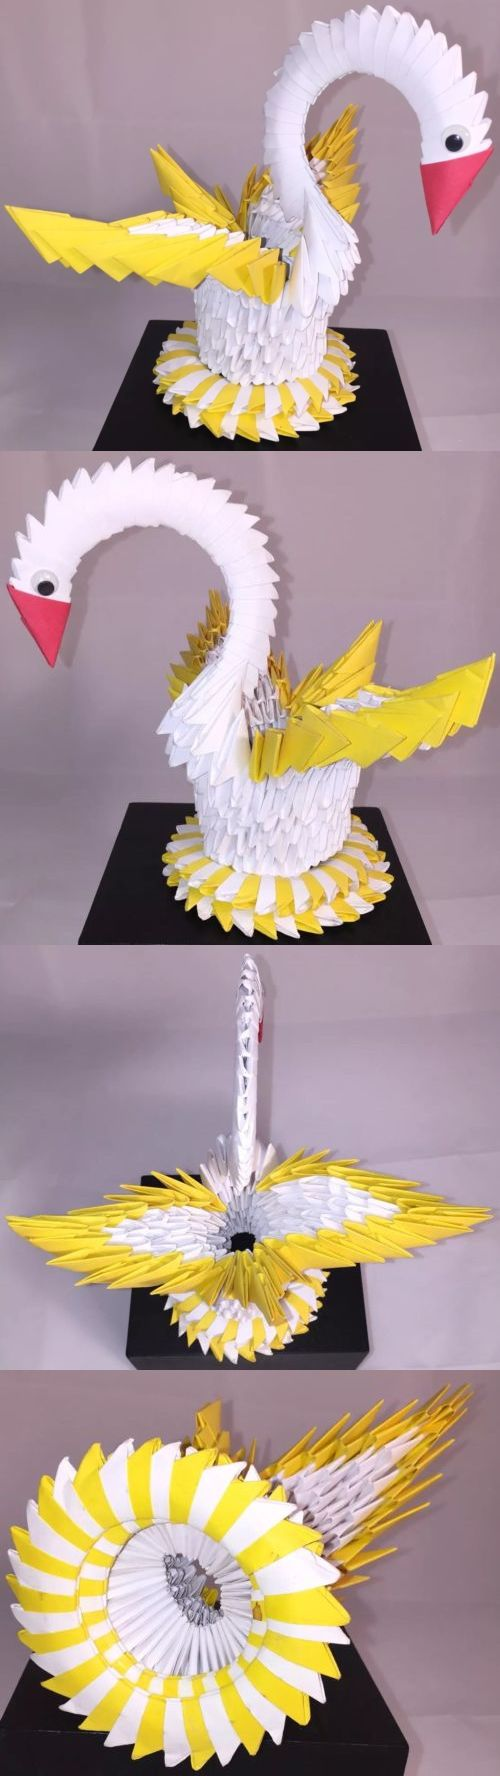 Pin Swan Origami Diagram On Pinterest